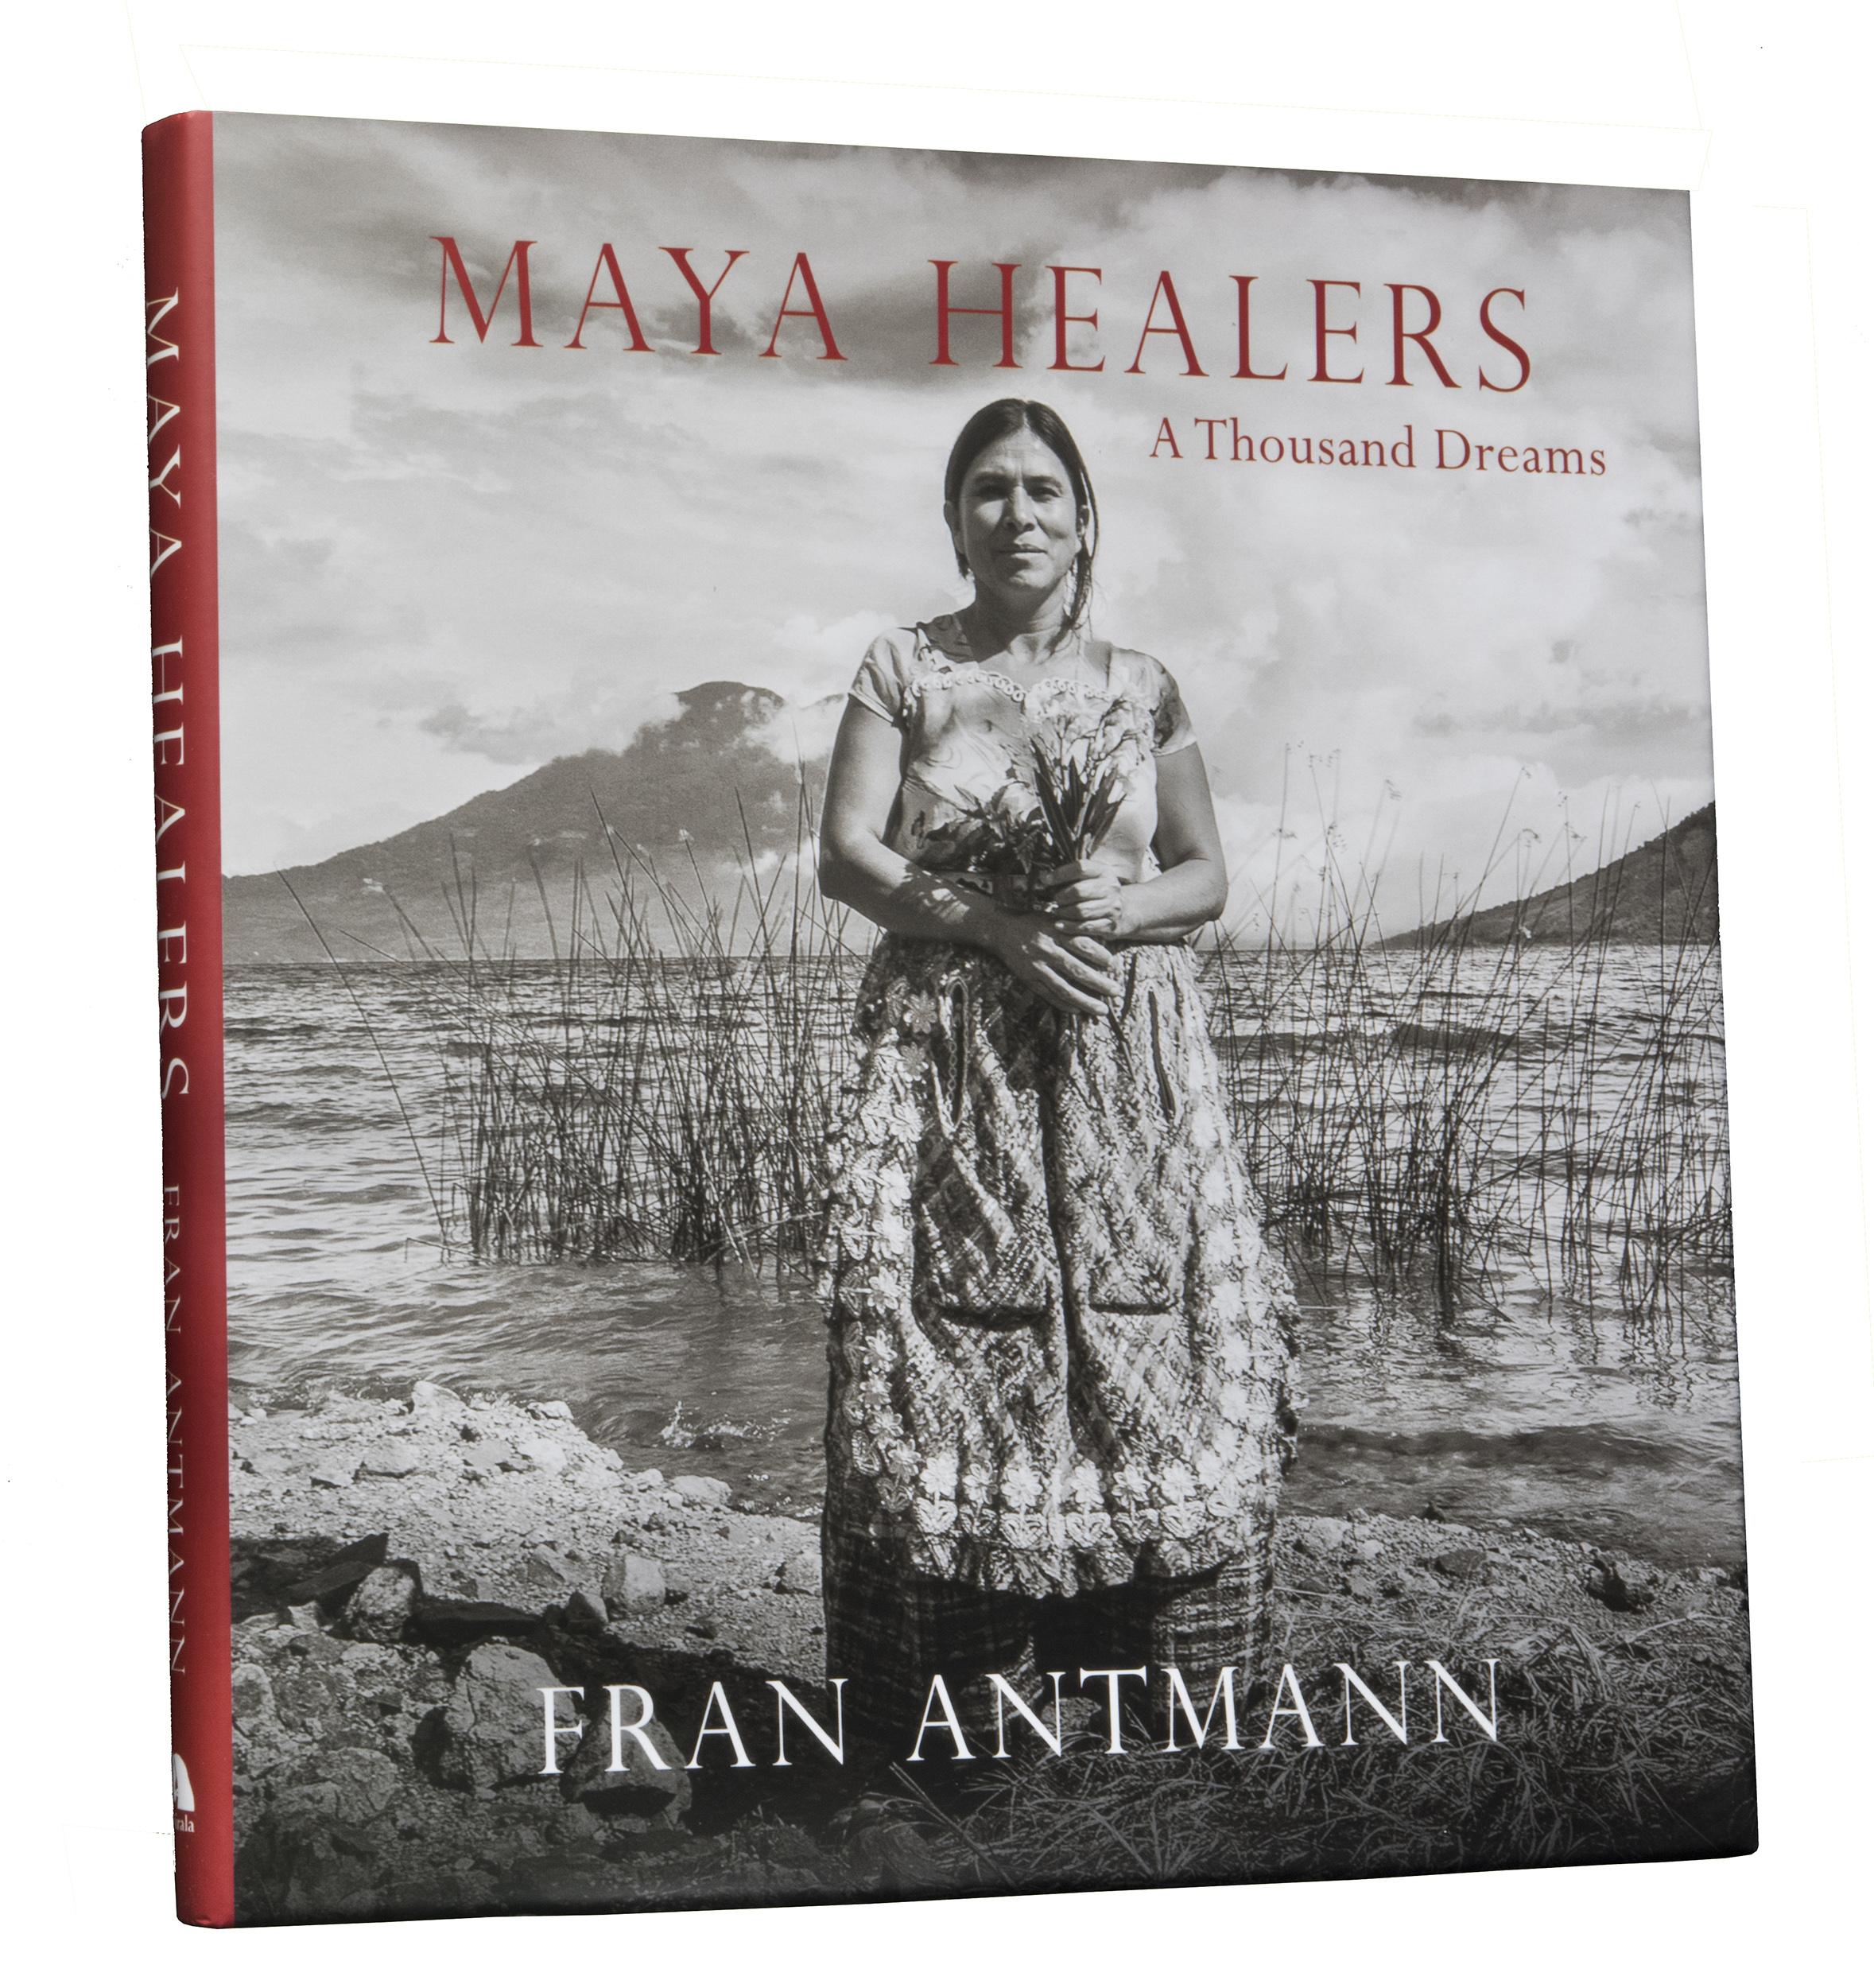 Image: Fran Antmann's book